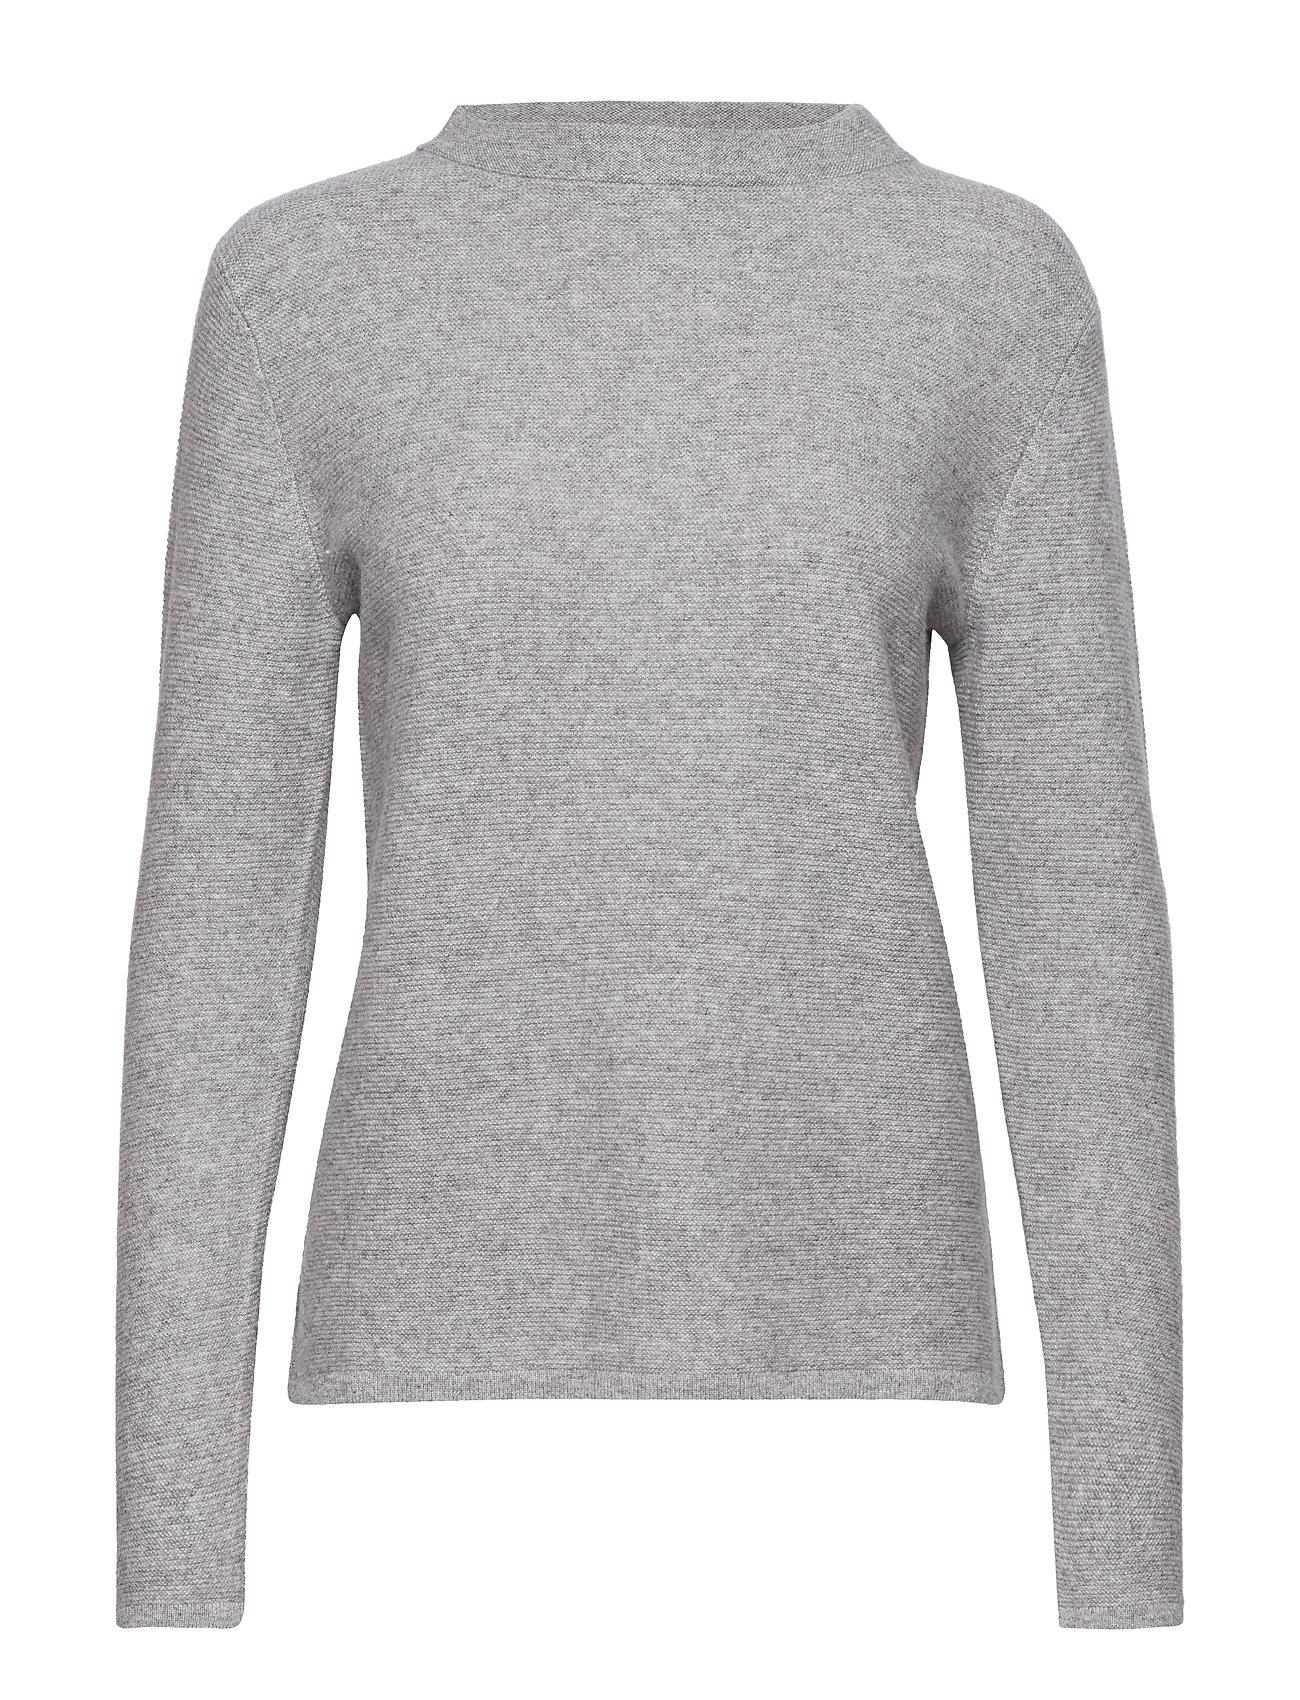 GreyDavida Cashmere GreyDavida Slit Sweaterlight Semipolo Semipolo Sweaterlight Cashmere Slit dtsQhCr